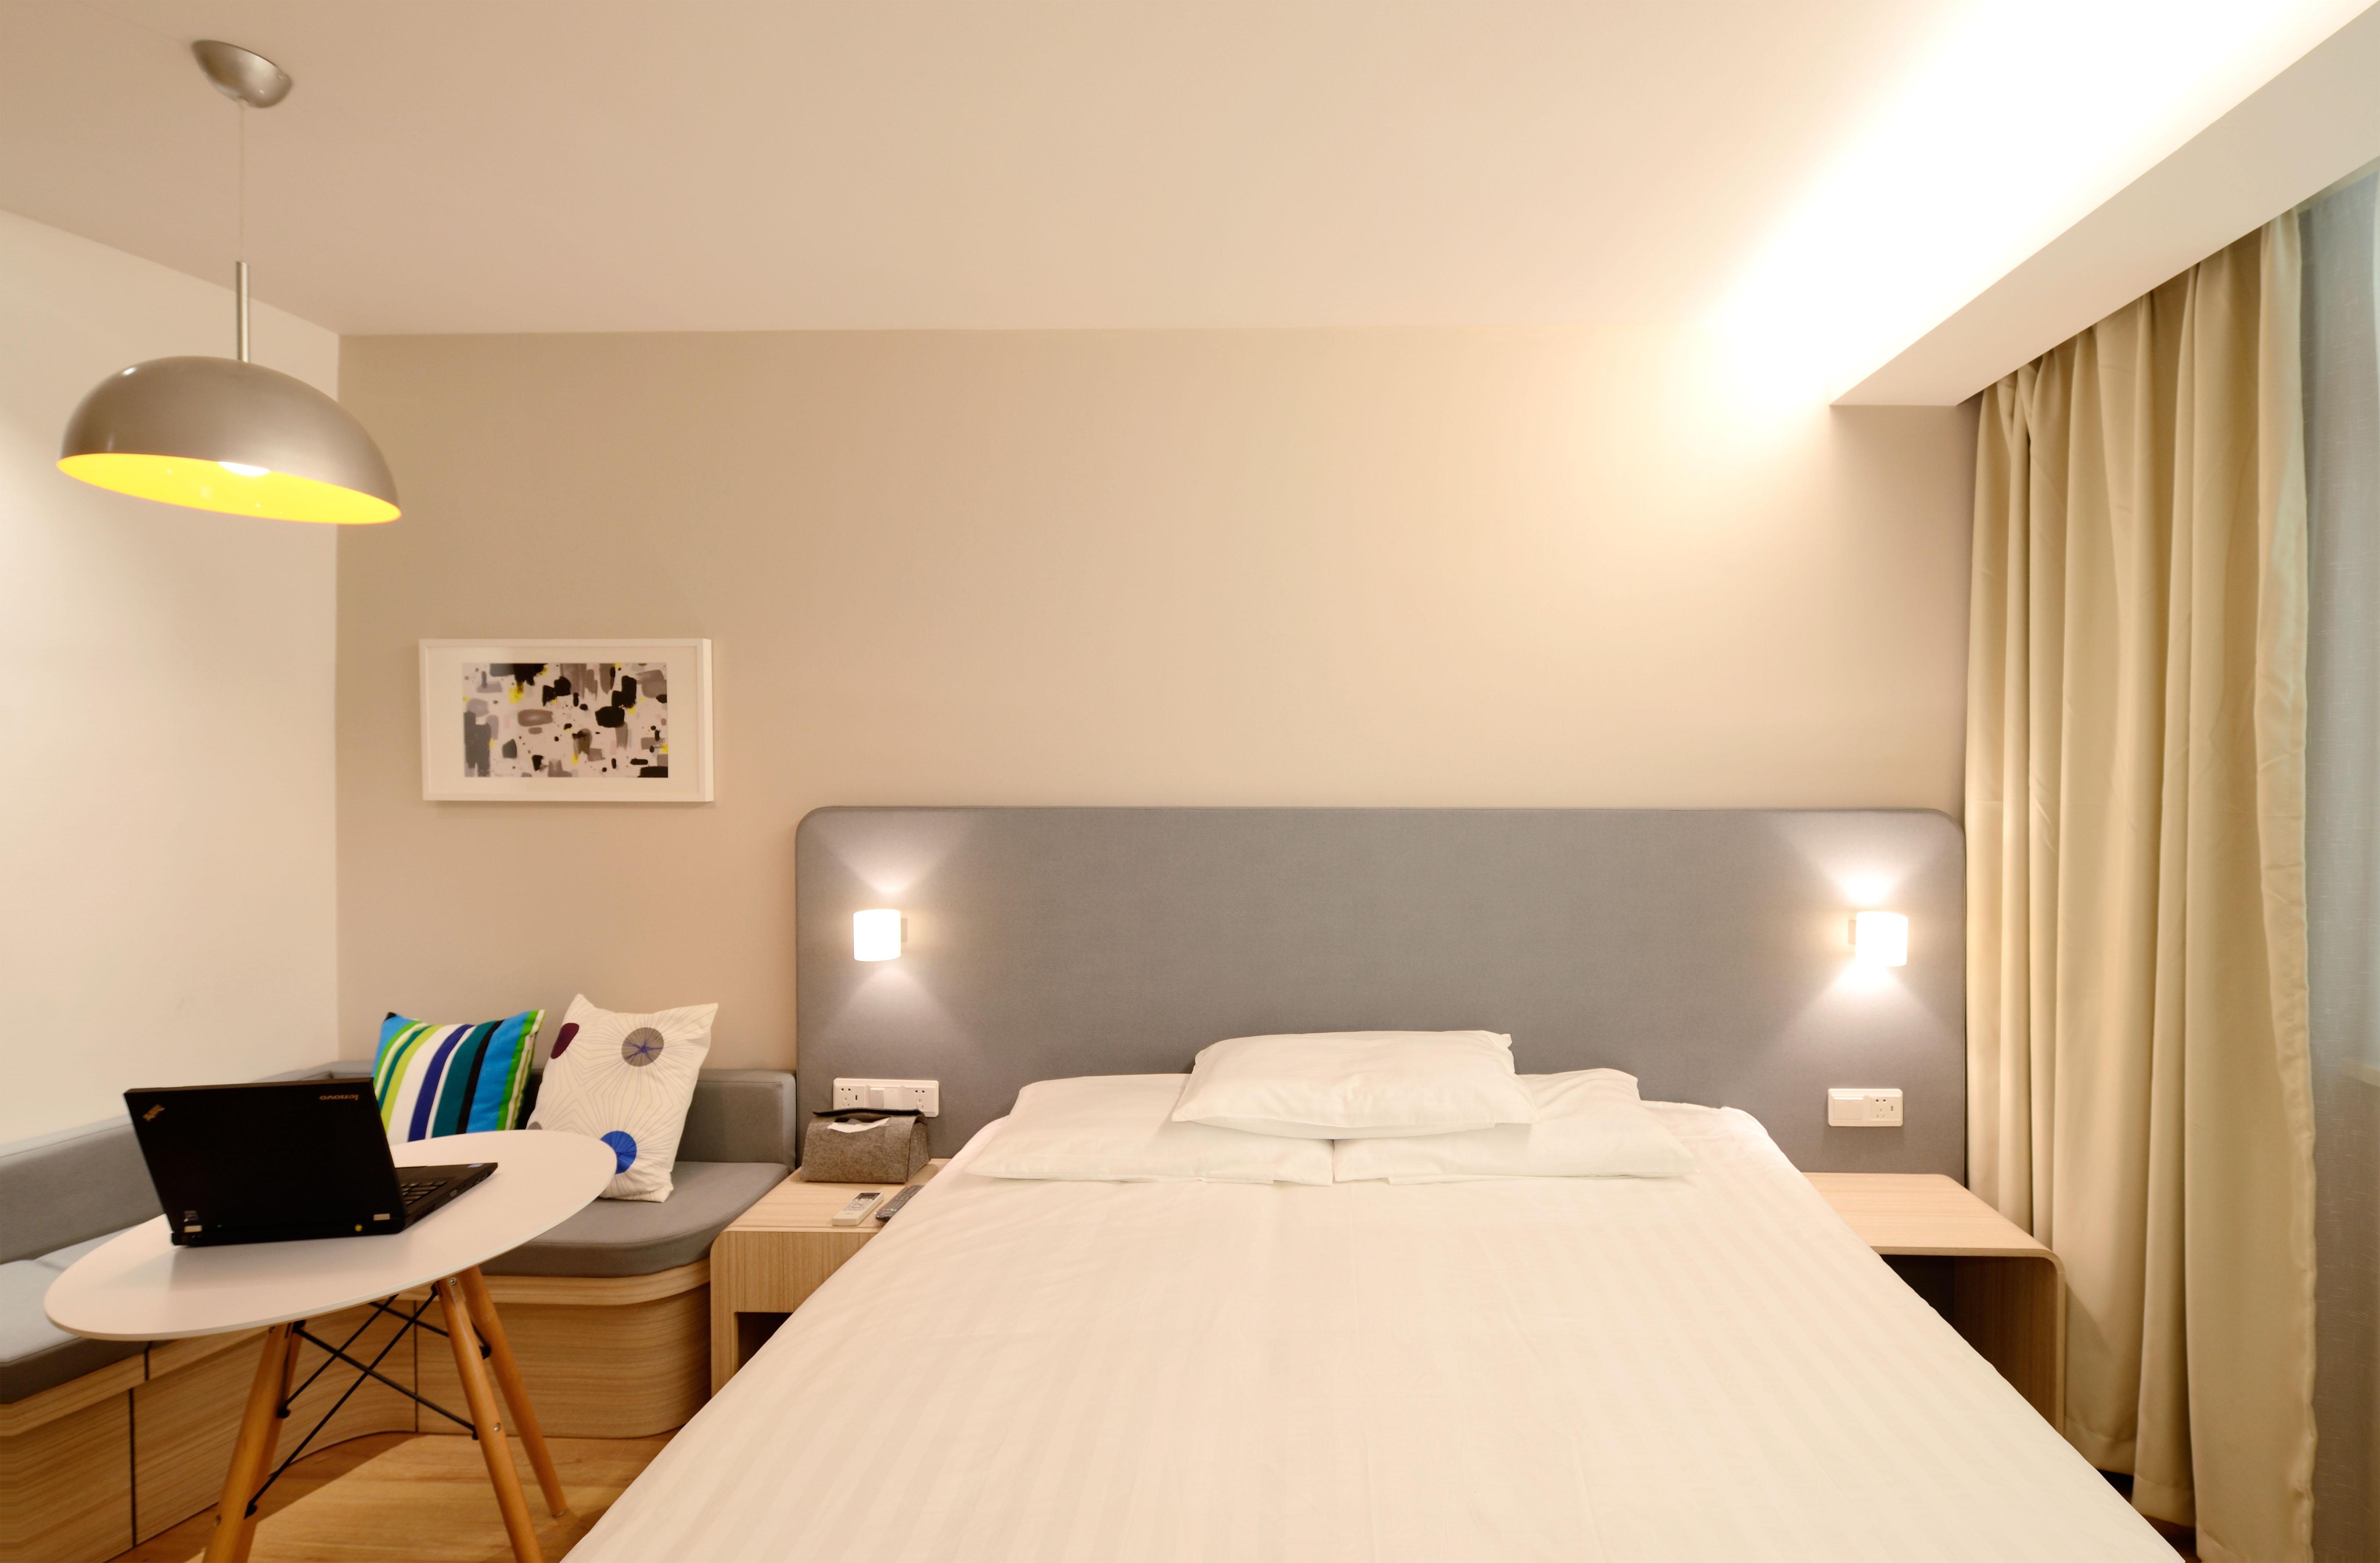 hotel bedroom lighting. Floor Ceiling Cottage Property Room Lighting Bedroom Apartment Interior Design Hotel New Suite Real Estate I